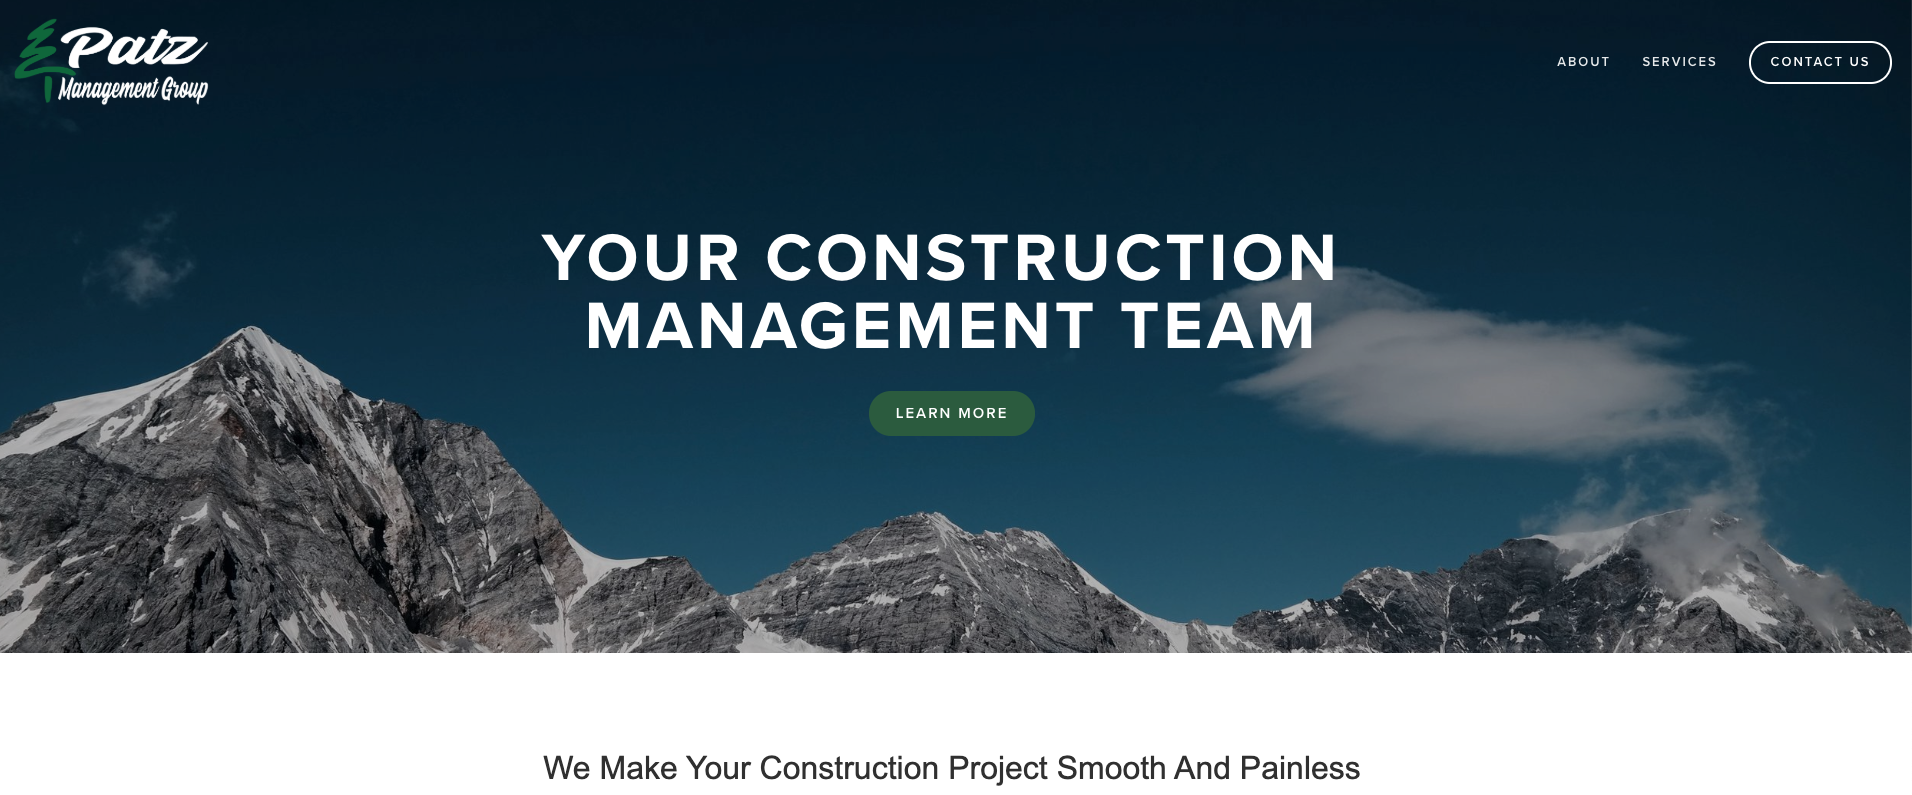 Patz Management Group website design using Squarespace.